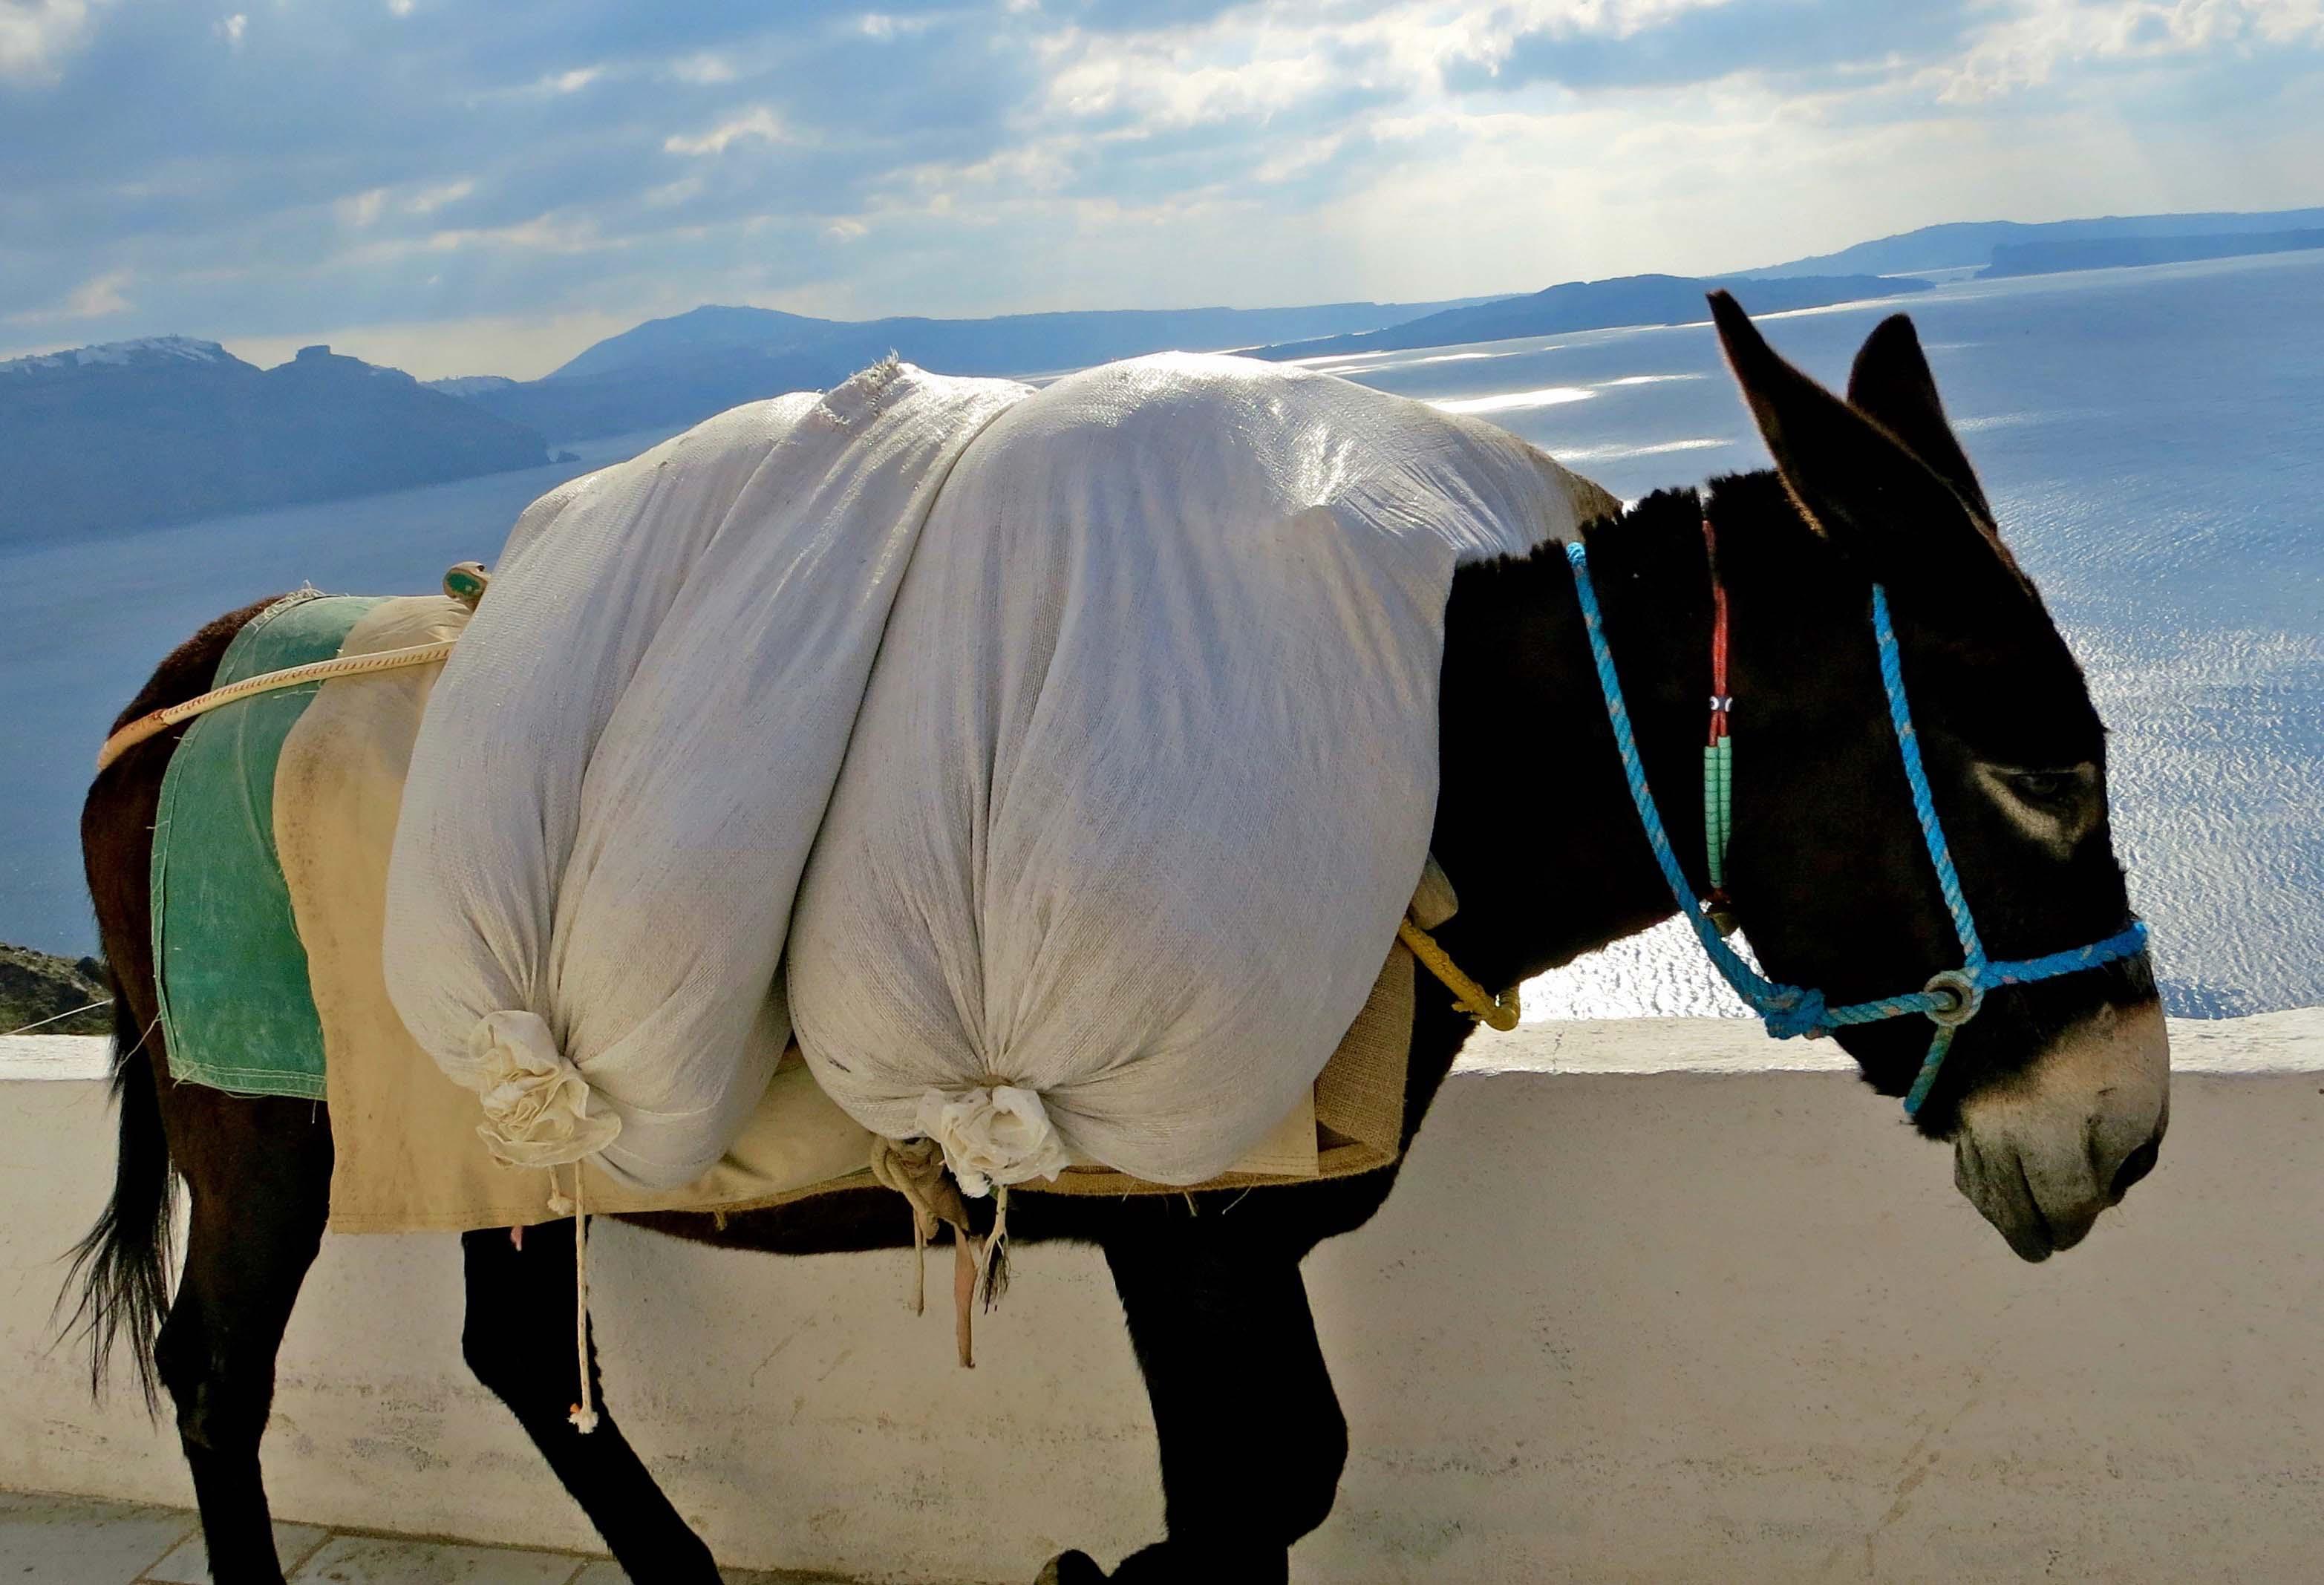 Photo of heavily laden mule on the Greek Island of Santorini by Curtis Mekemson.